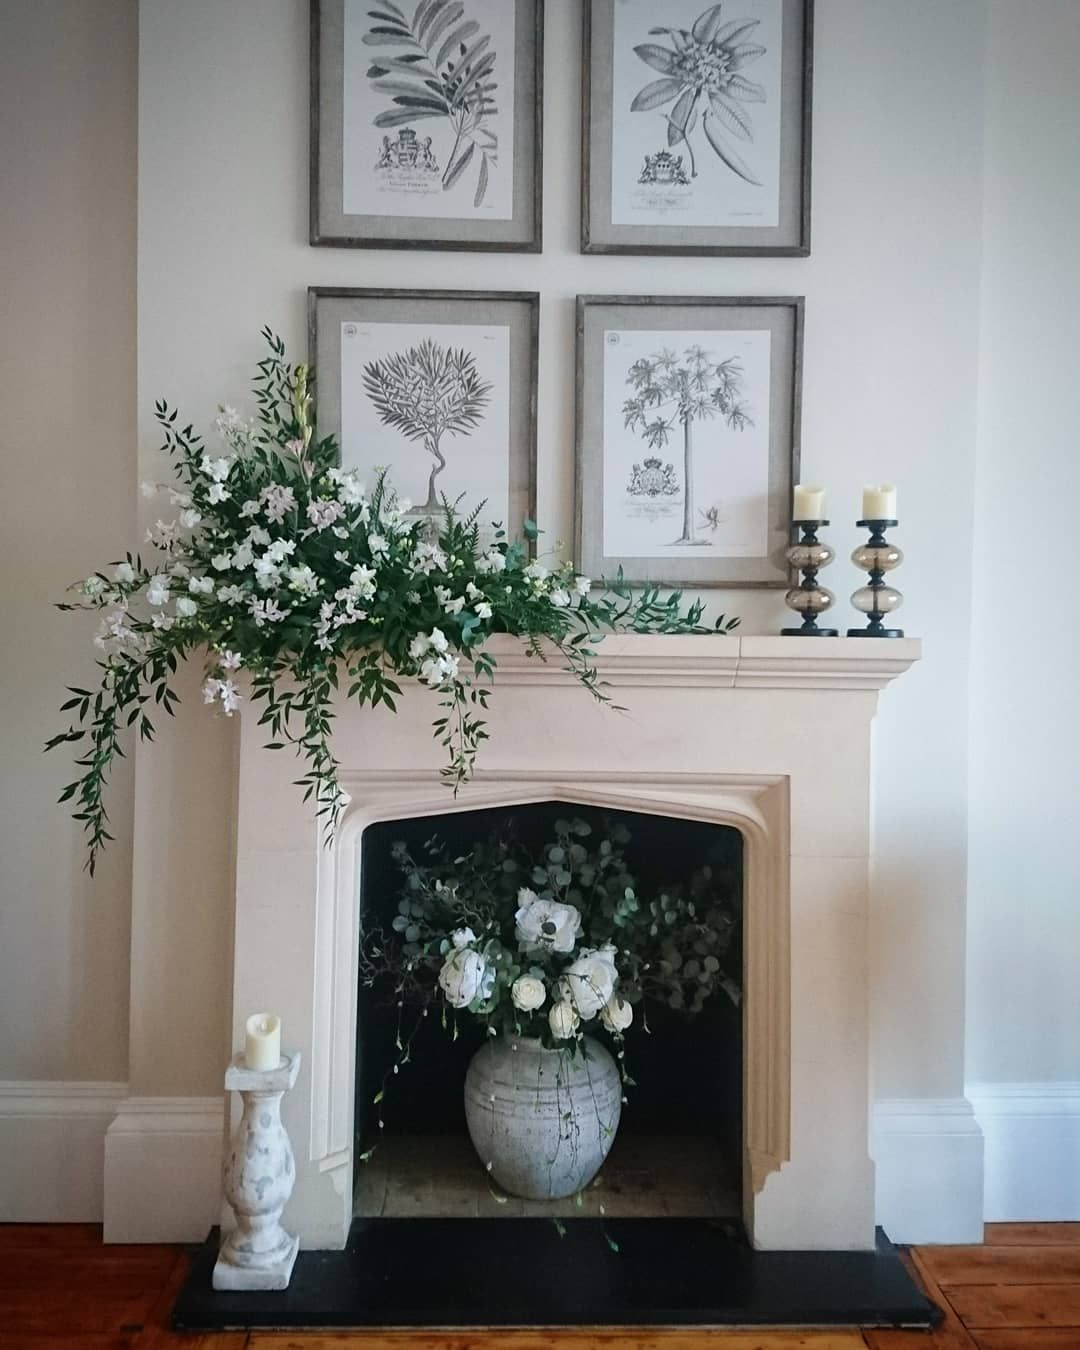 "Chepstow Florist on Instagram: ""Mantelpiece decor @sttewdricshouse today #mantelpiecedecor #sttewdricswedding #fireplace #fireplacedecor #fireplaceflowers…"""